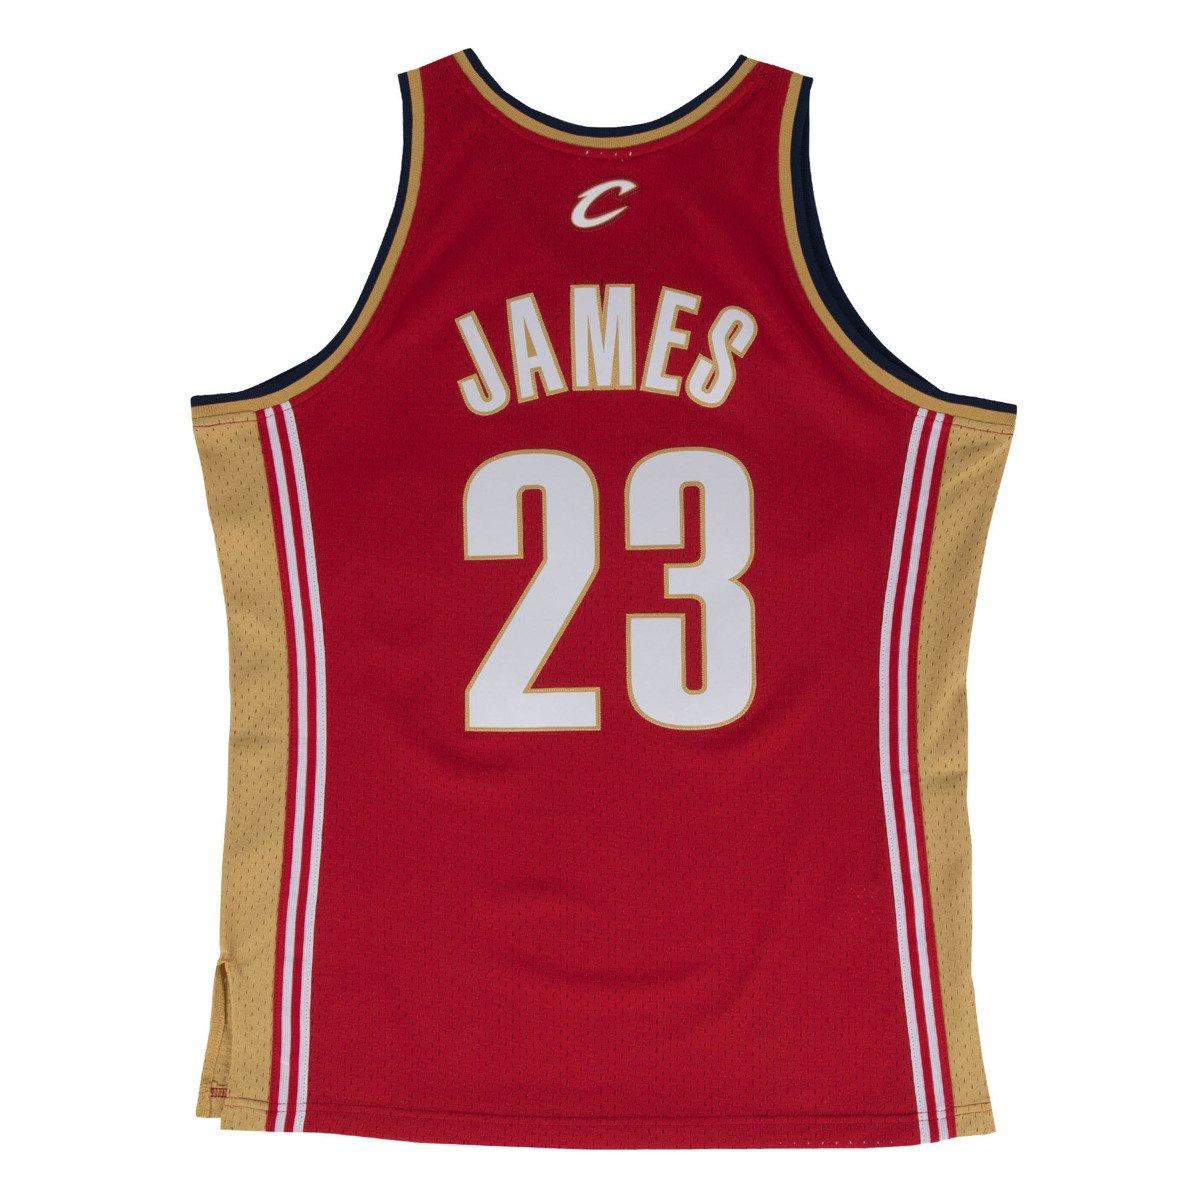 b8346d13757 Mitchell & Ness LeBron James 2003-04 NBA Swingman Cleveland Cavaliers Jersey  - Basketo.fr